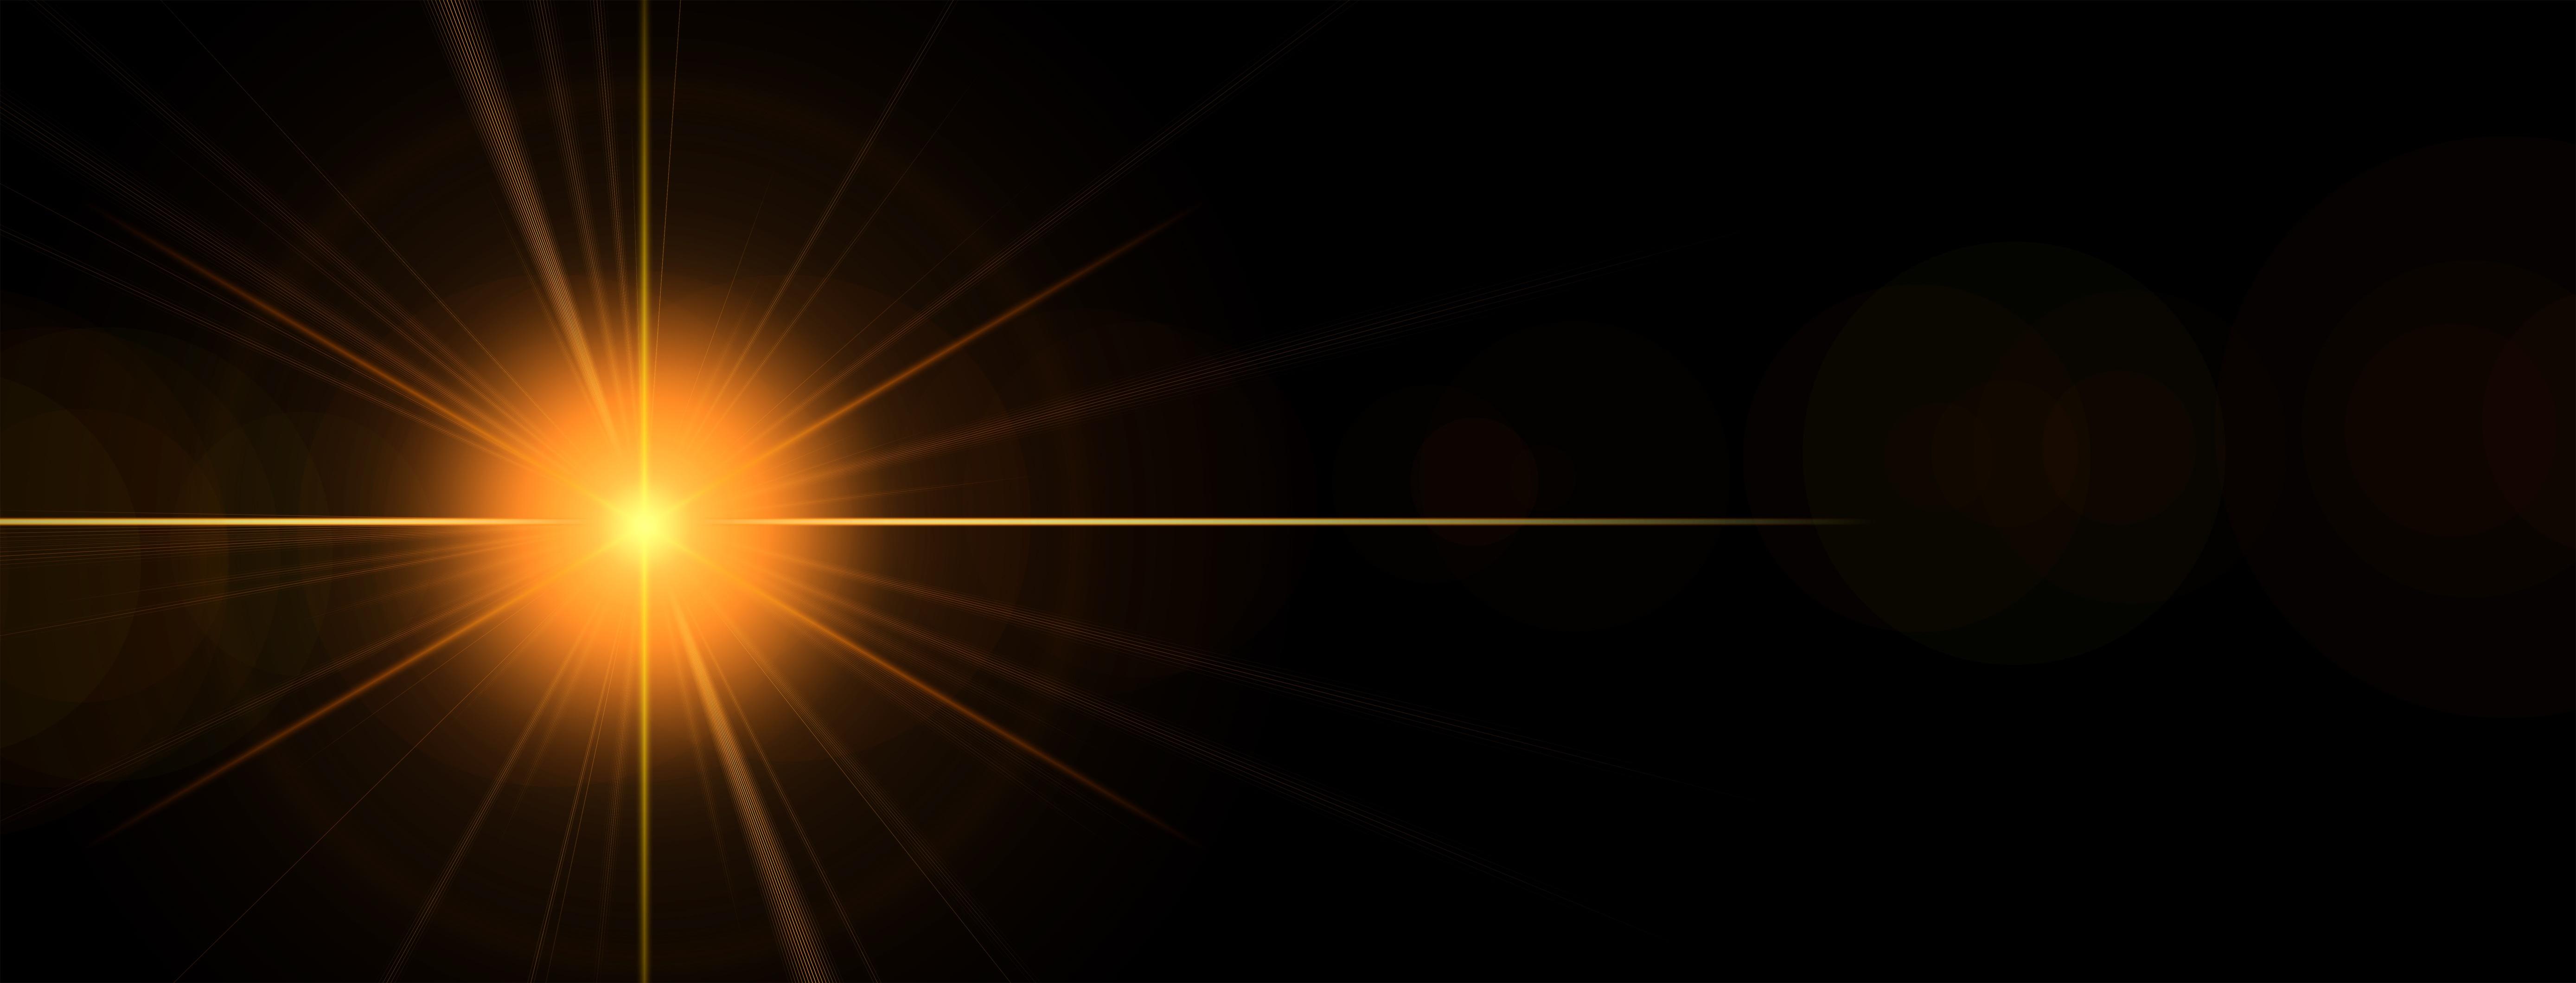 Flash Of Light On Dark Background Free Image